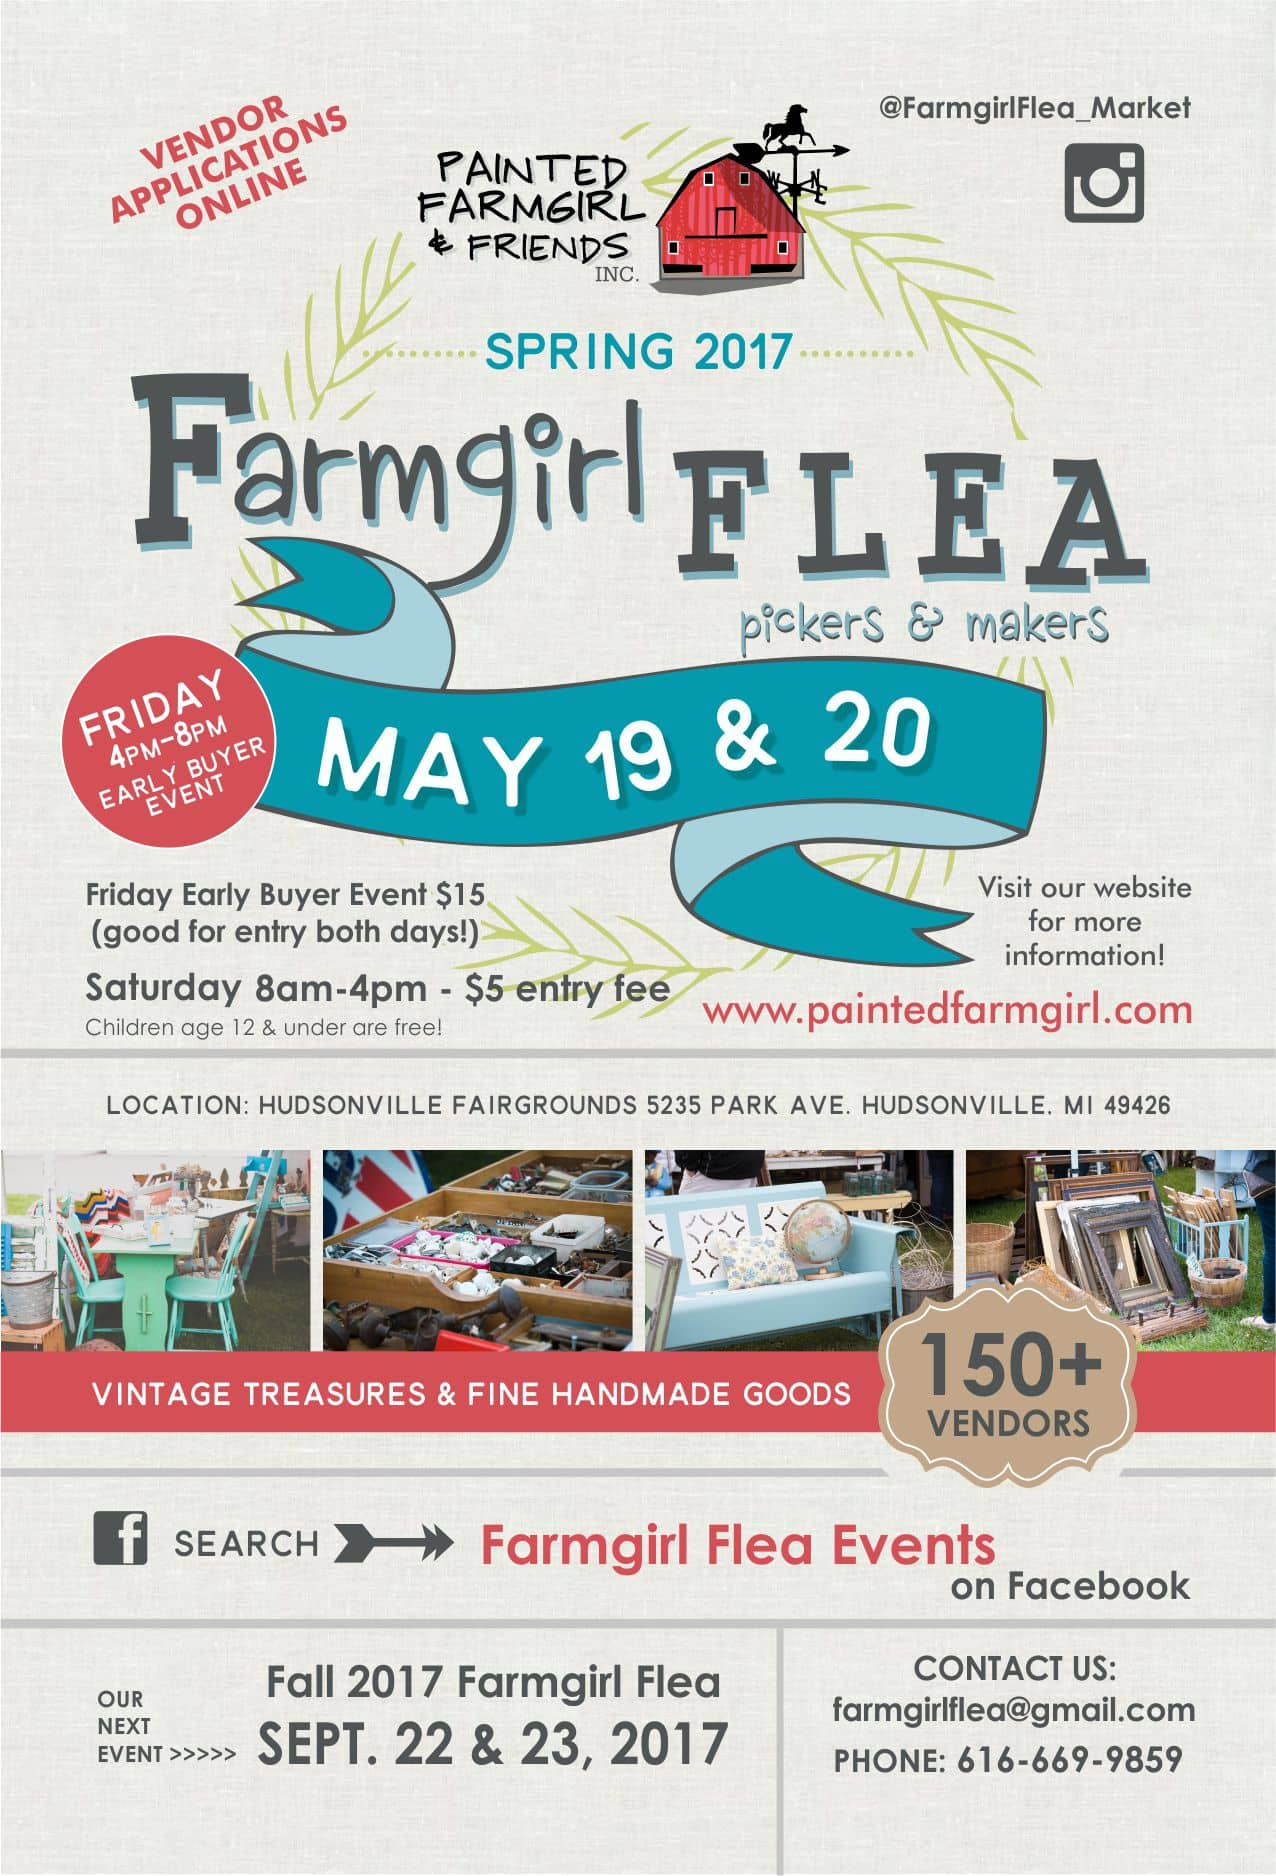 custom designed flea market flyer